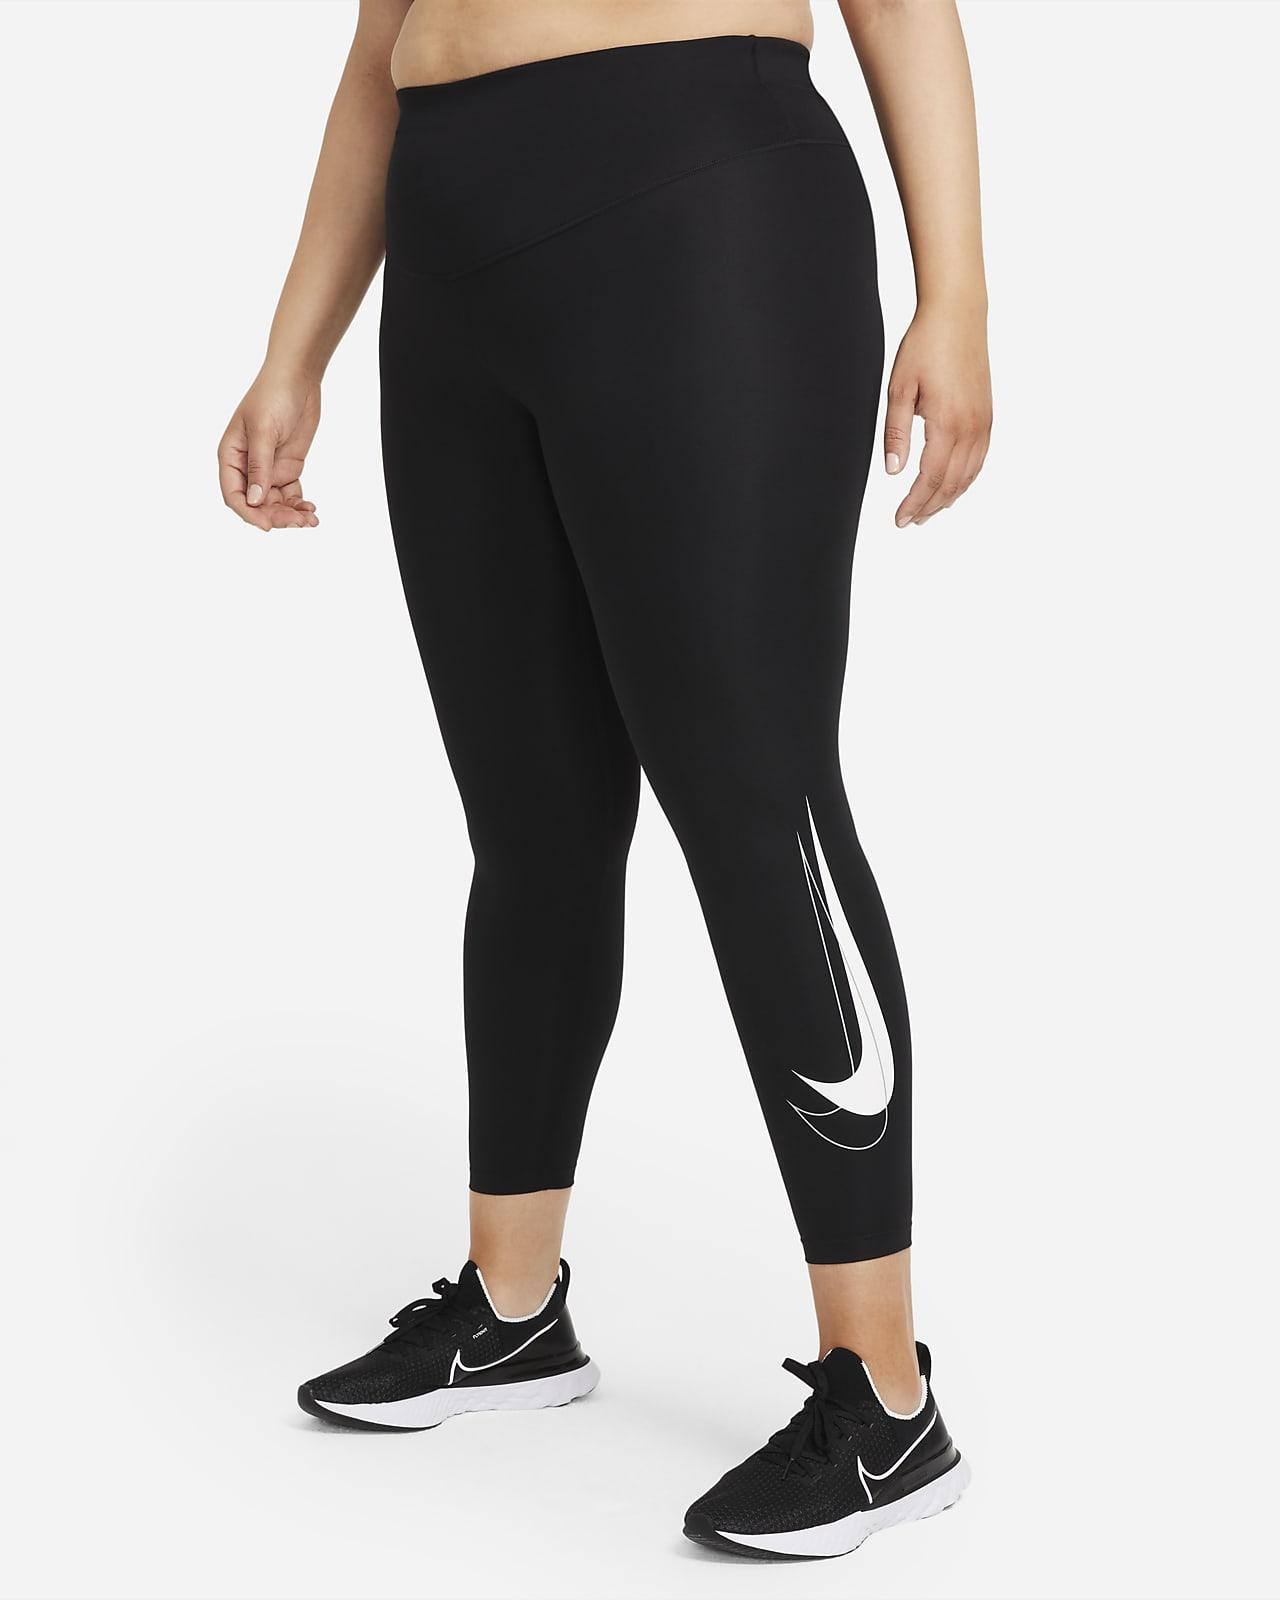 Legging de running 7/8 taille mi-basse Nike Dri-FIT Swoosh Run pour Femme (grande taille)